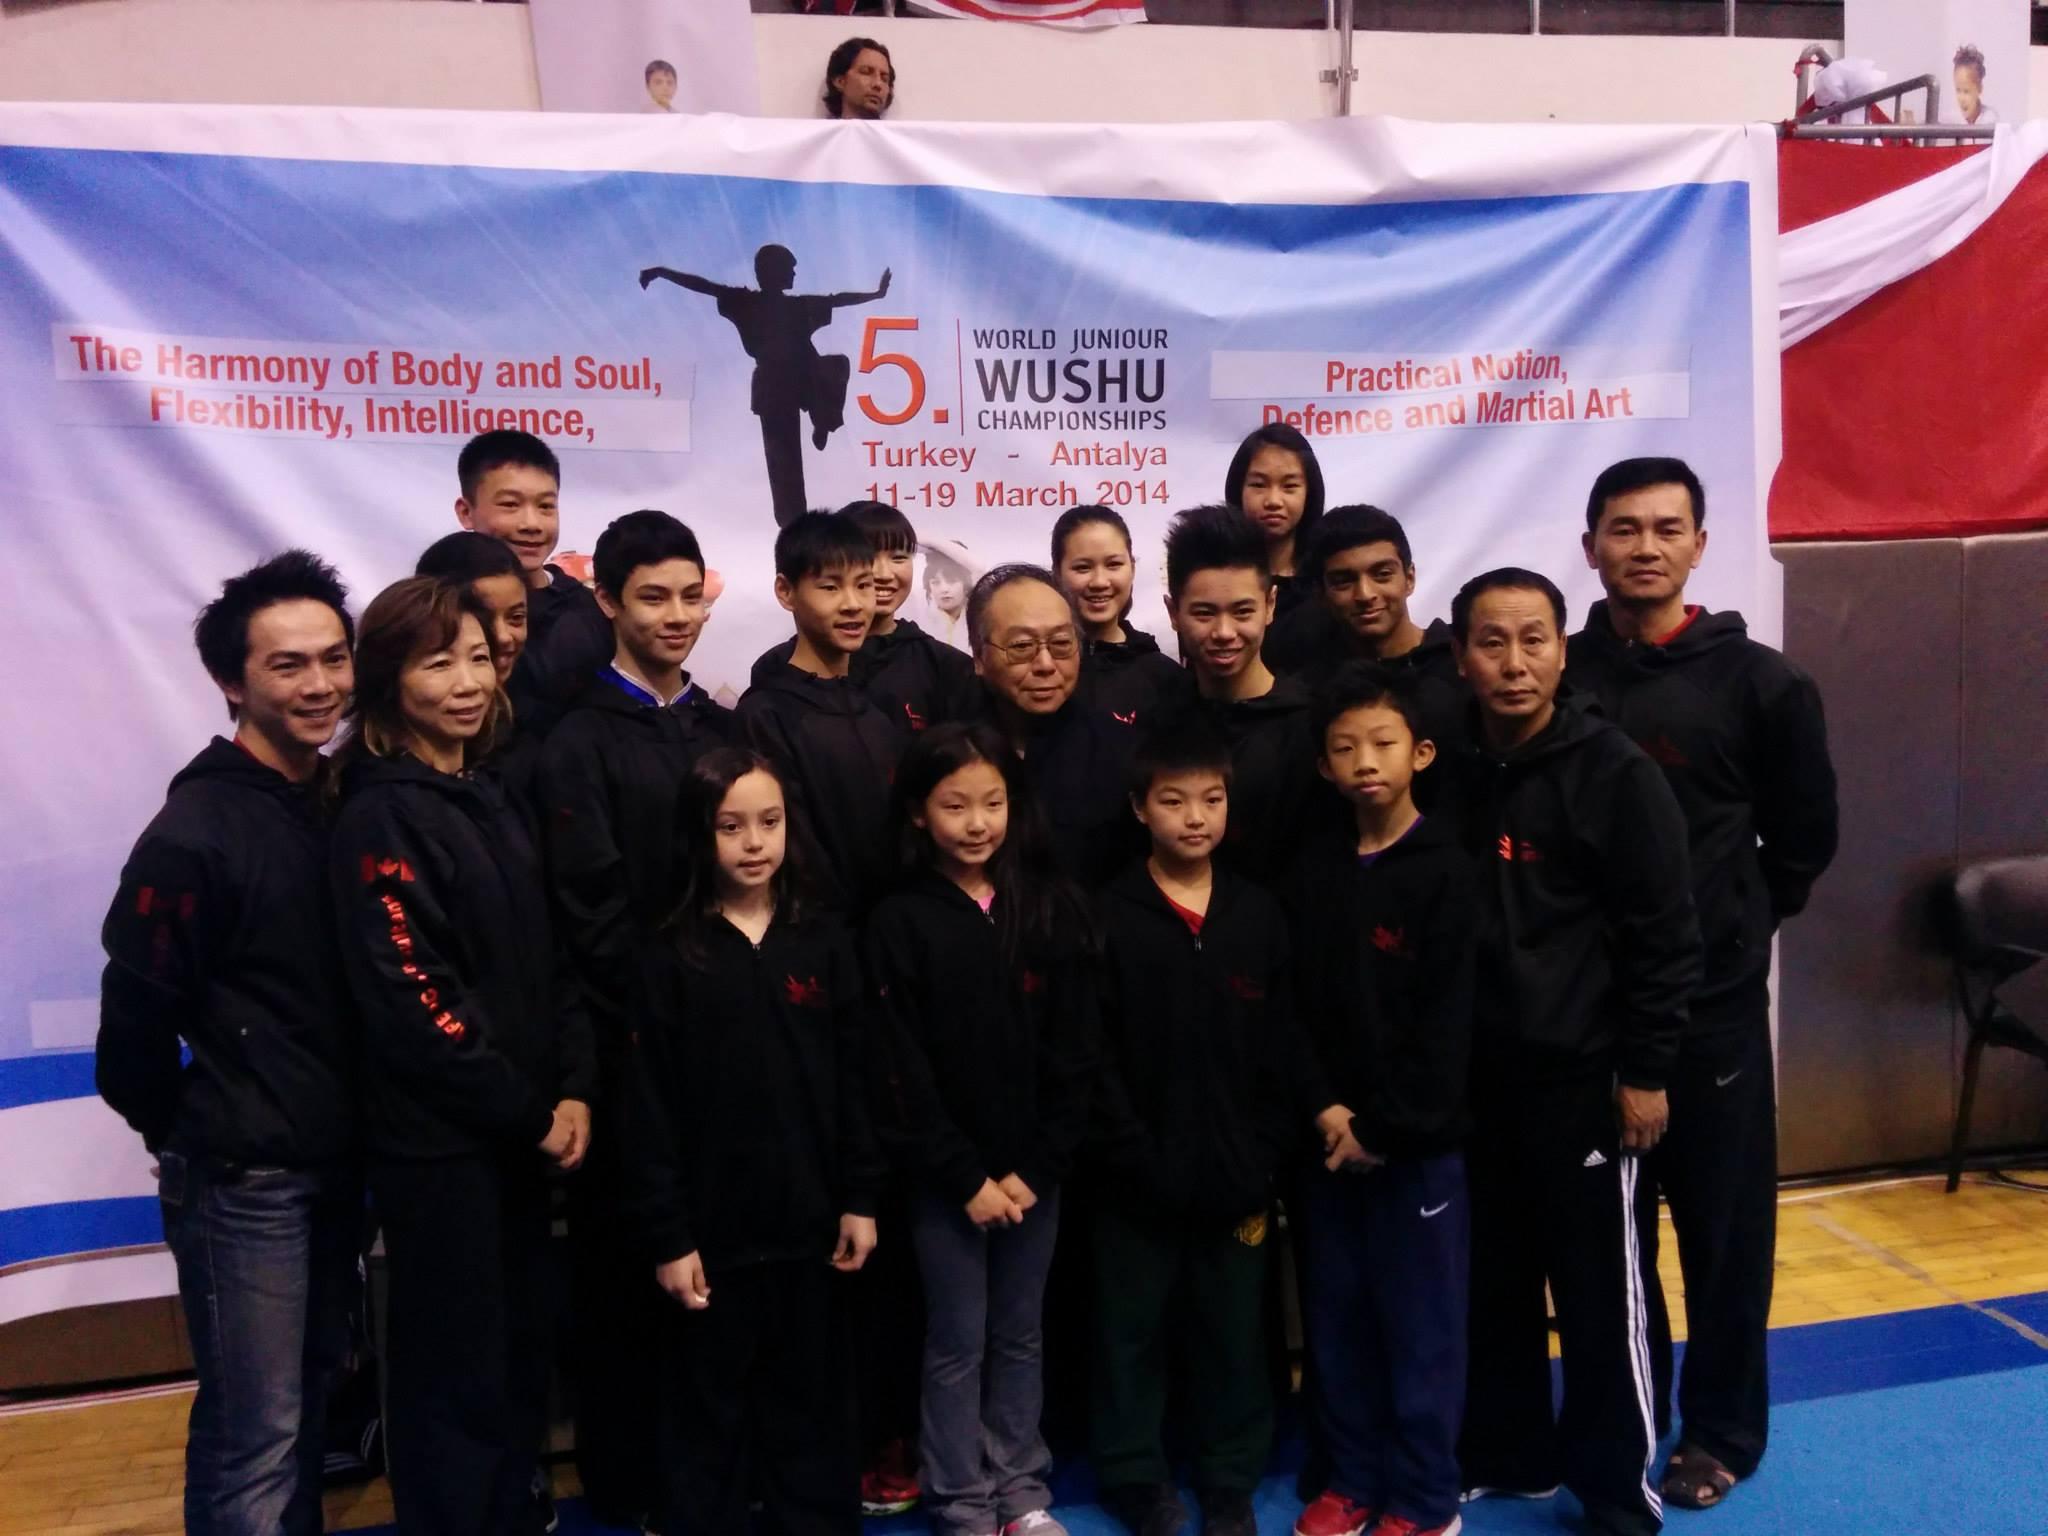 Wayland_Li_Wushu_World_Junior_Championships_2014_Team_Canada_in_Turkey_2.jpg